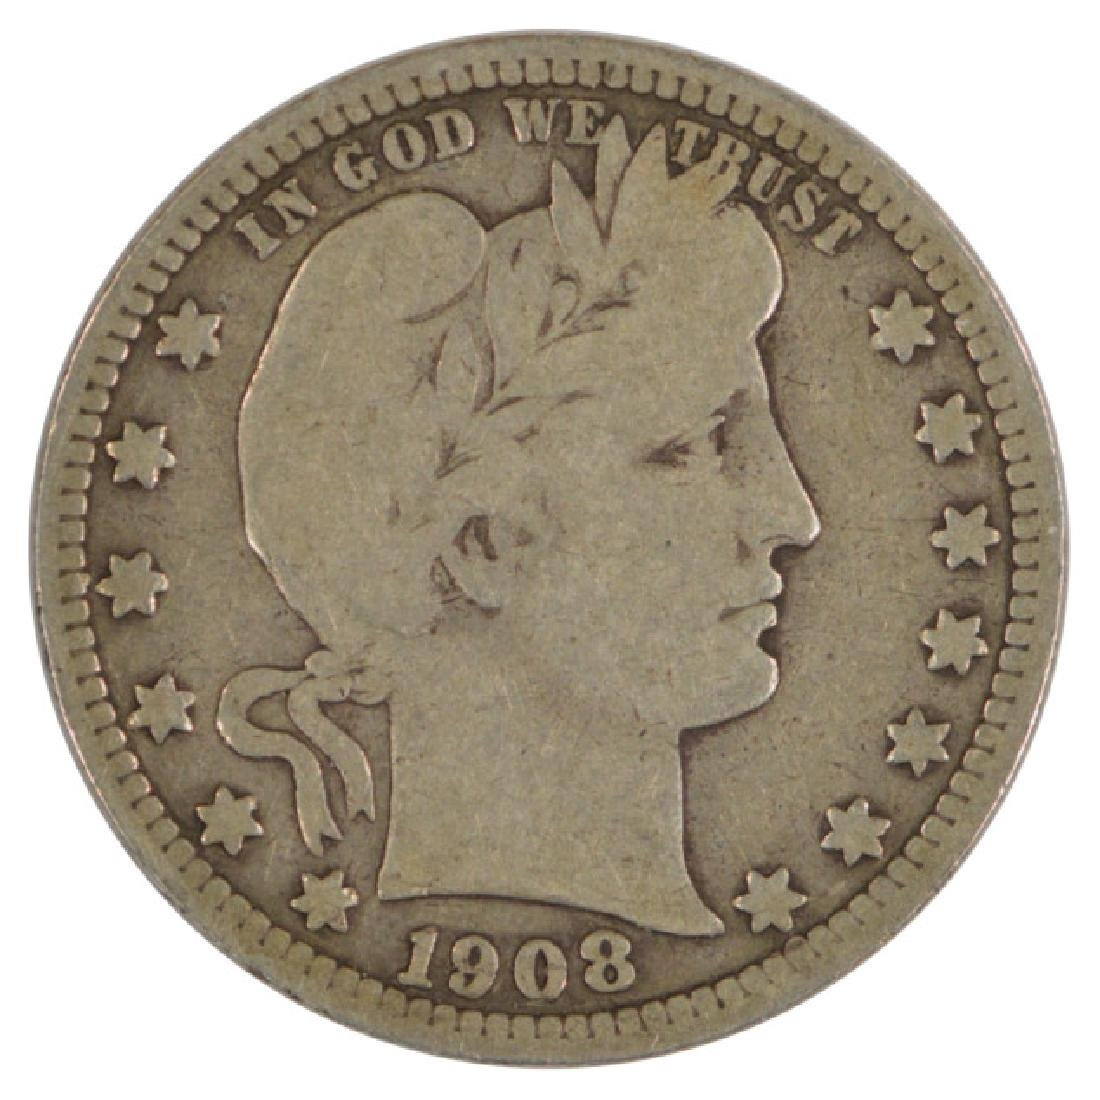 1908-S Barber Quarter Coin